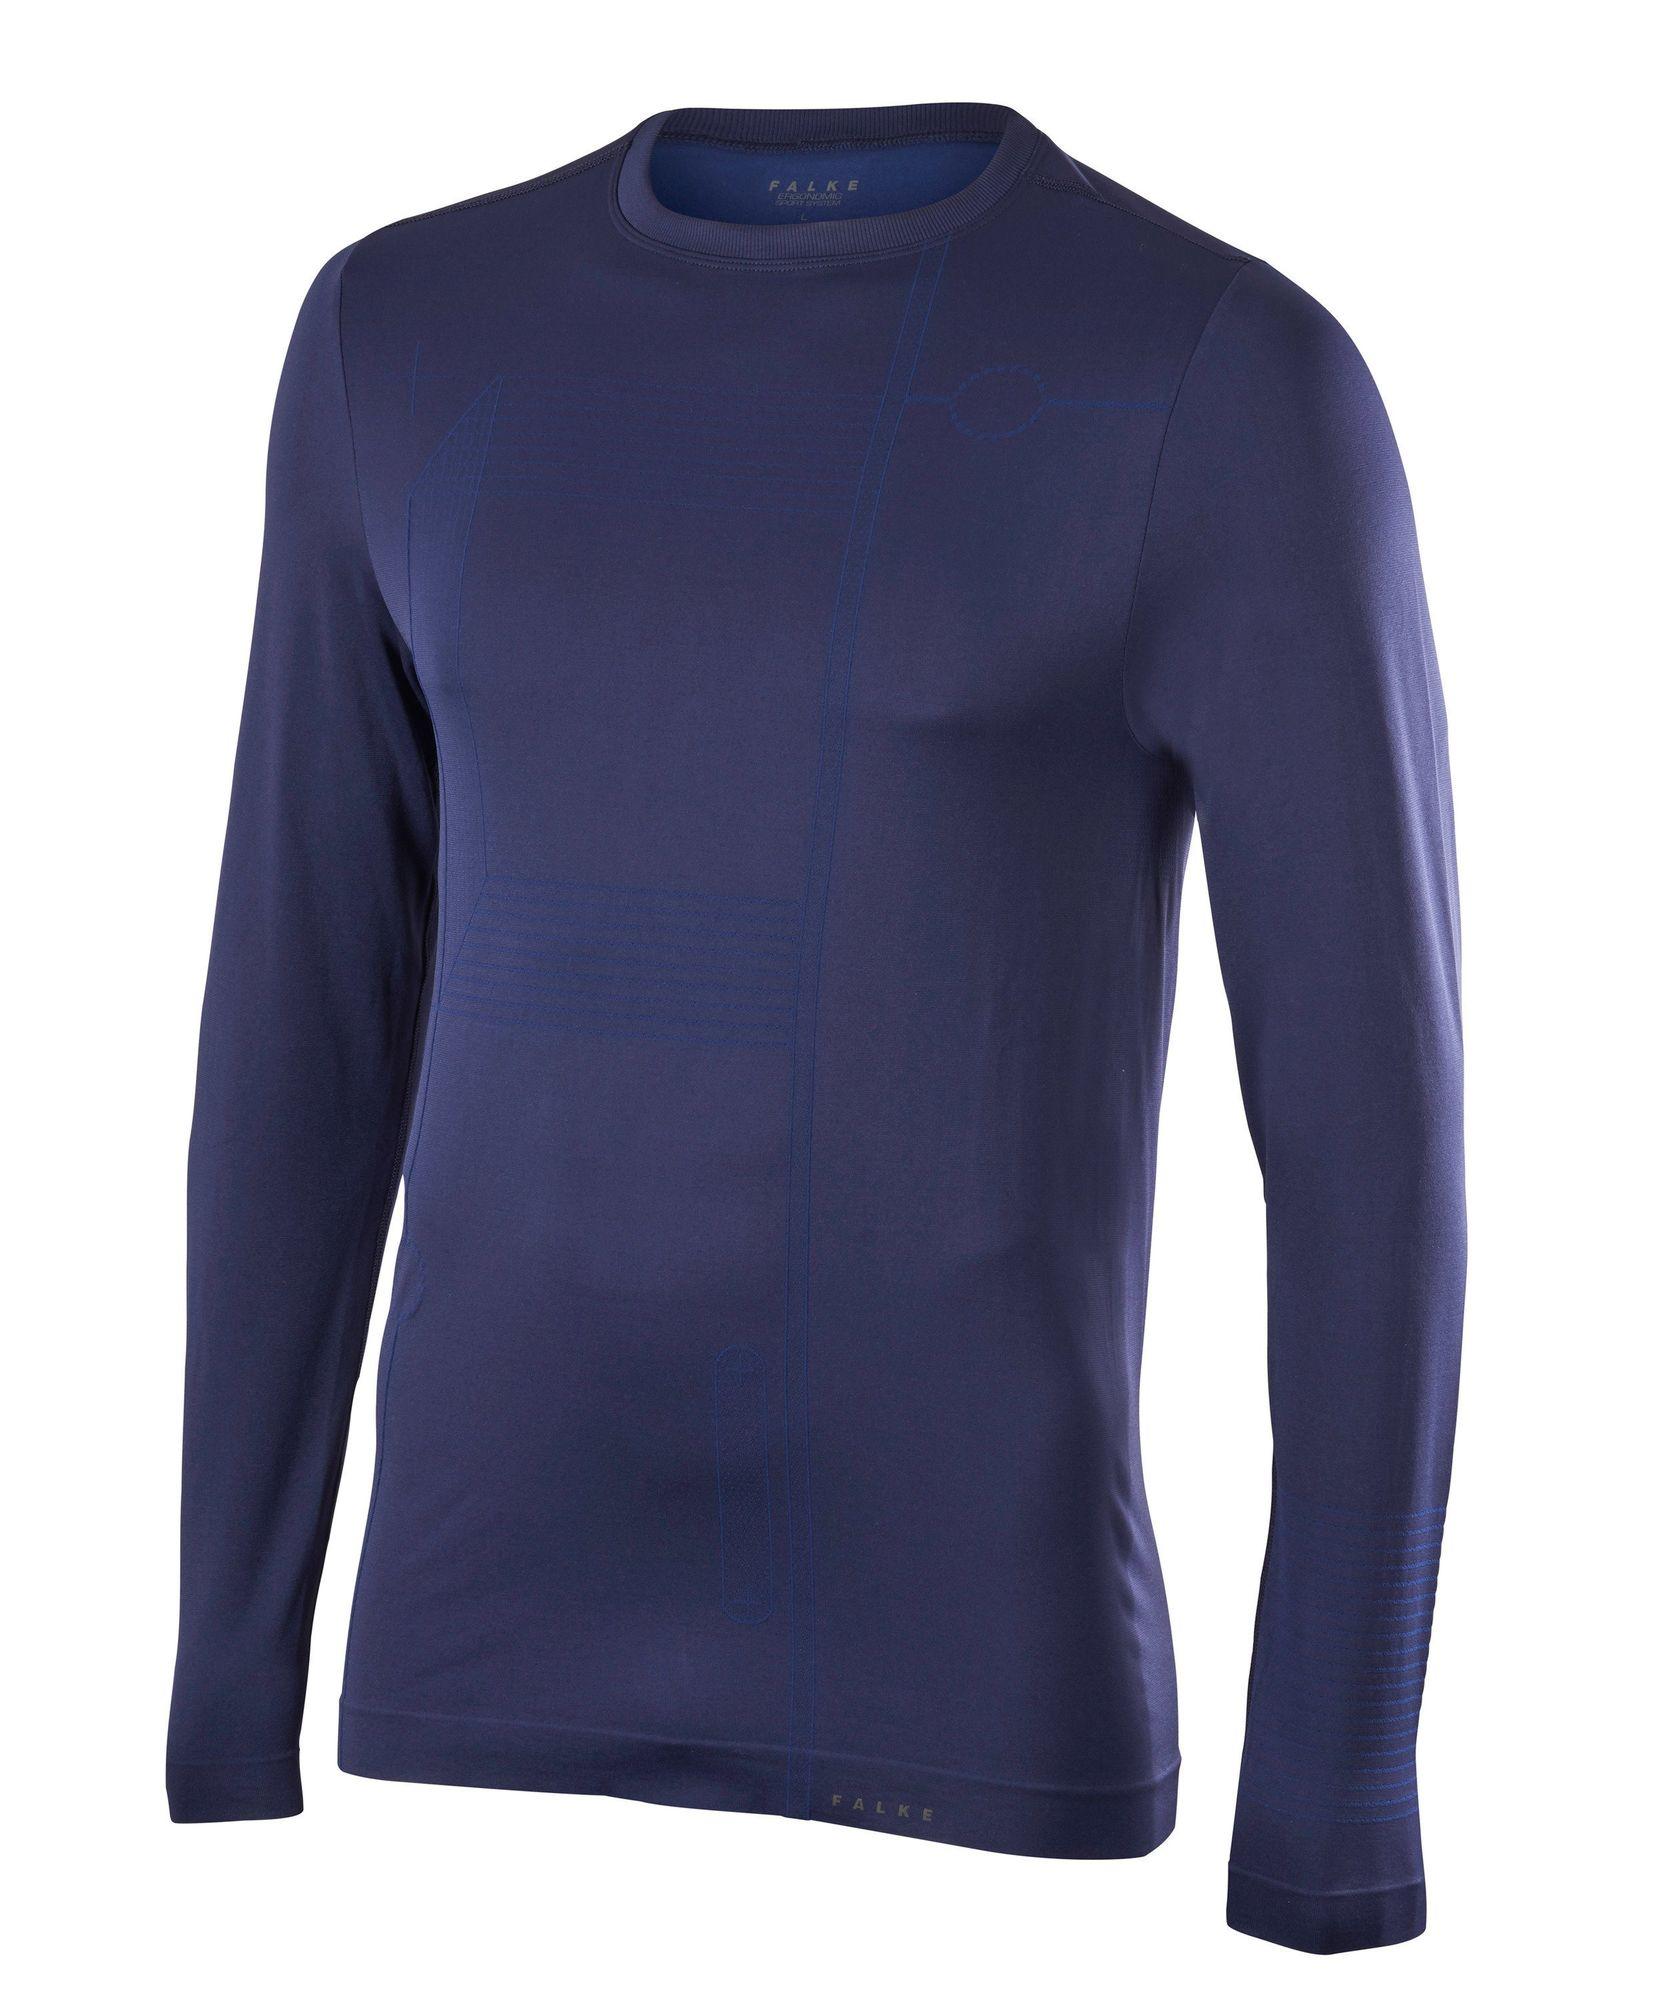 Falke Blueprint 2.0 Langarmshirt in Dunkelblau